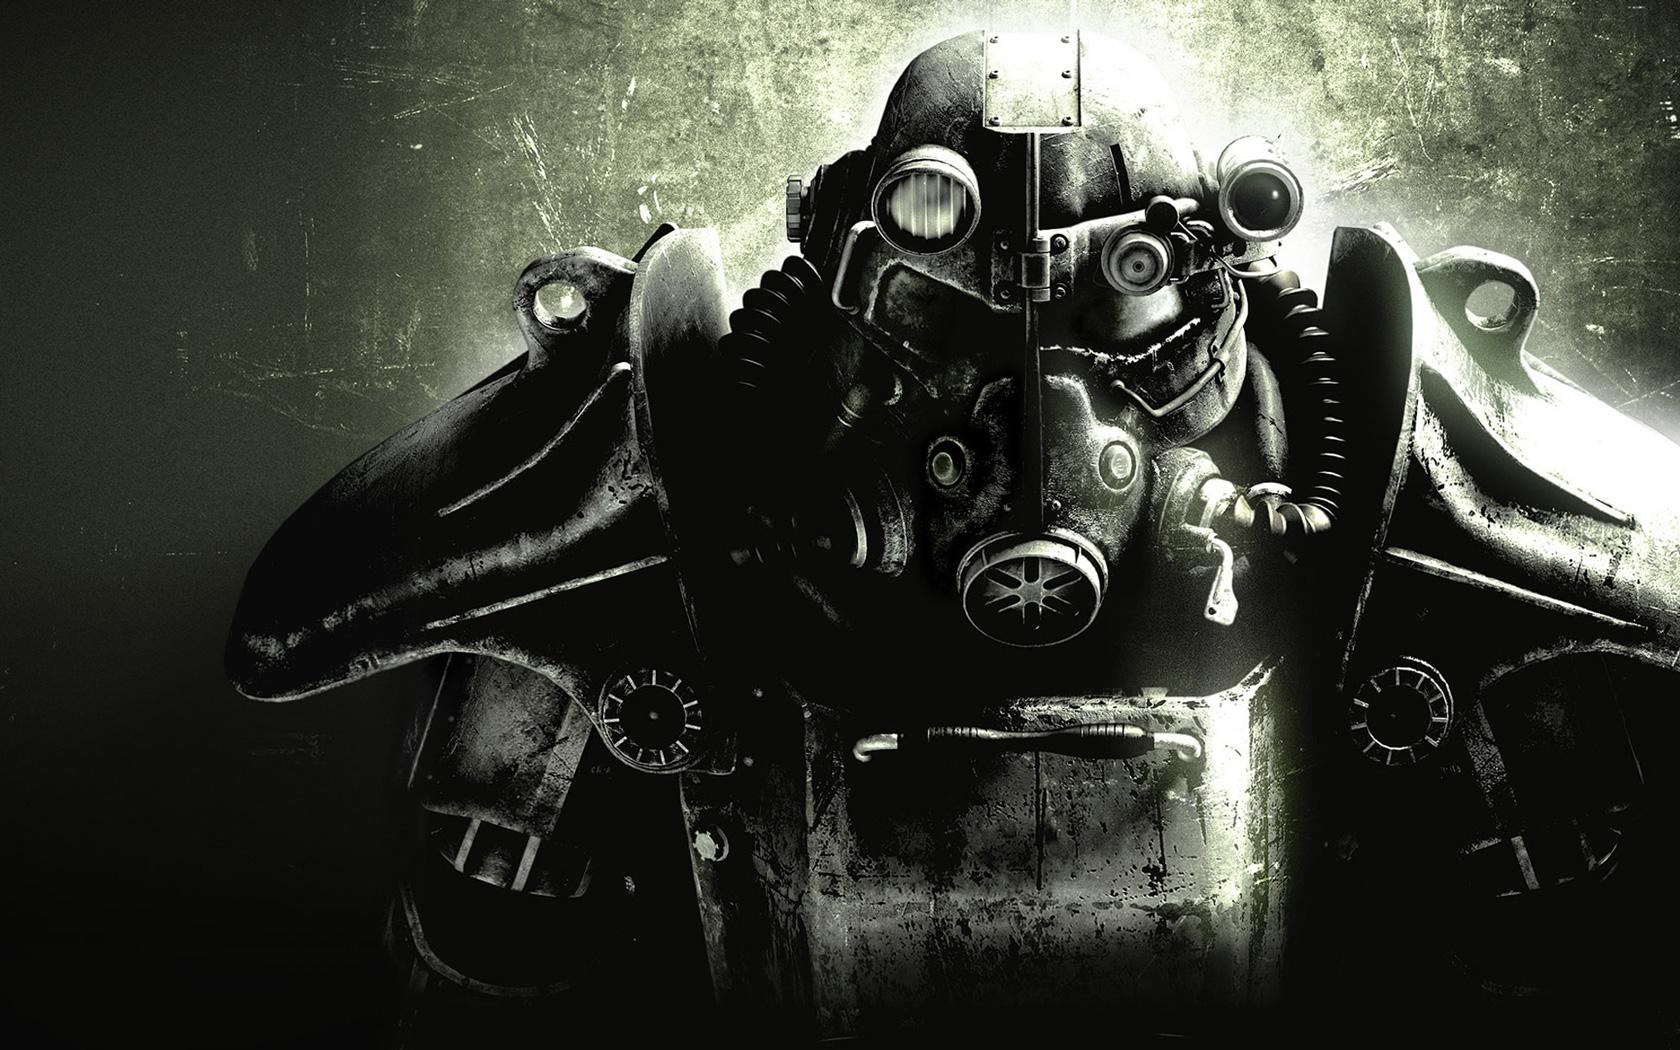 Free Fallout 3 Wallpaper in 1680x1050